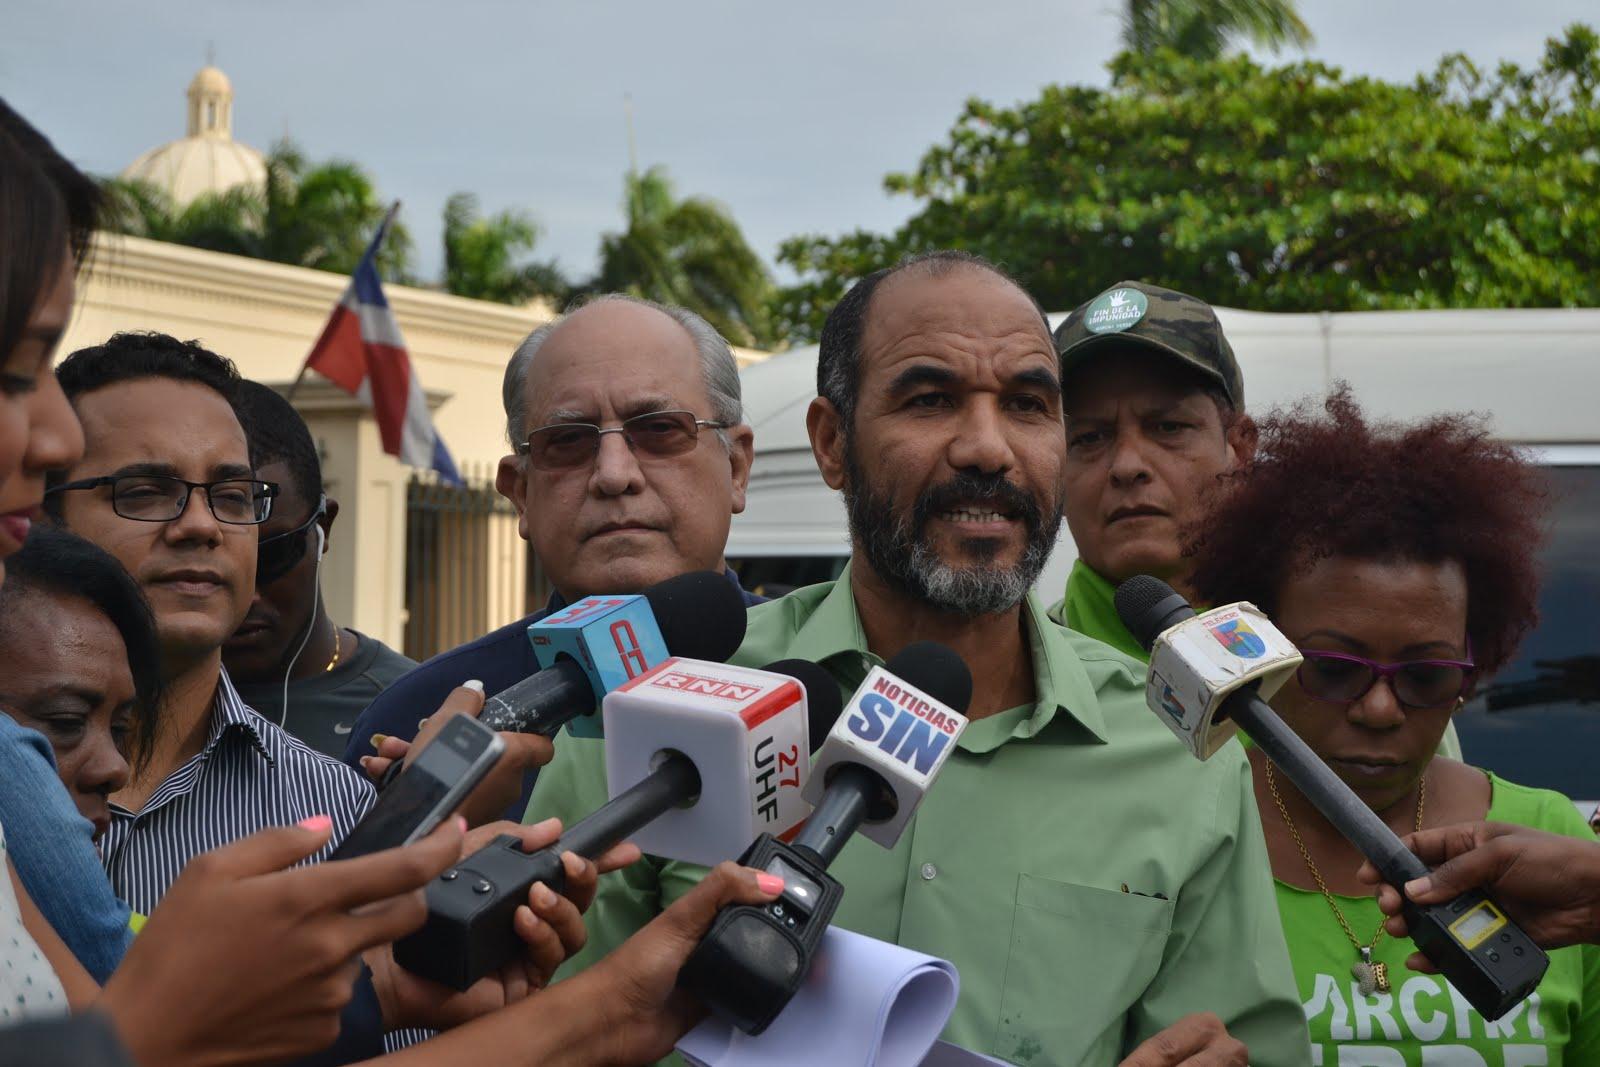 10 preguntas sobre caso Odebrecht, de Marcha Verde al presidente Danilo Medina